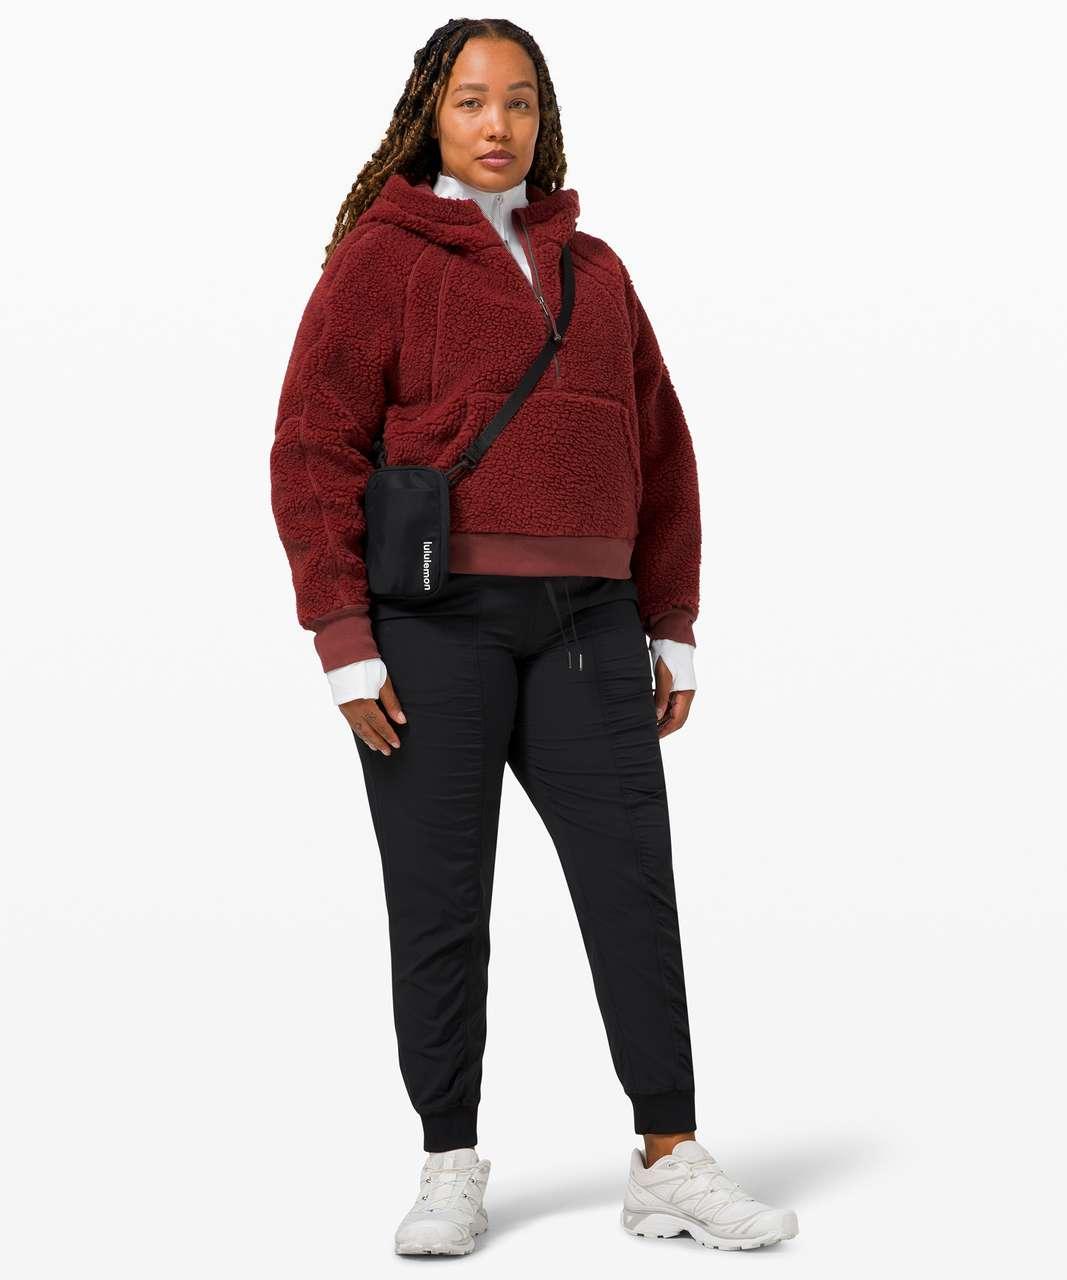 Lululemon Scuba Oversized Sherpa 1/2 Zip - Savannah